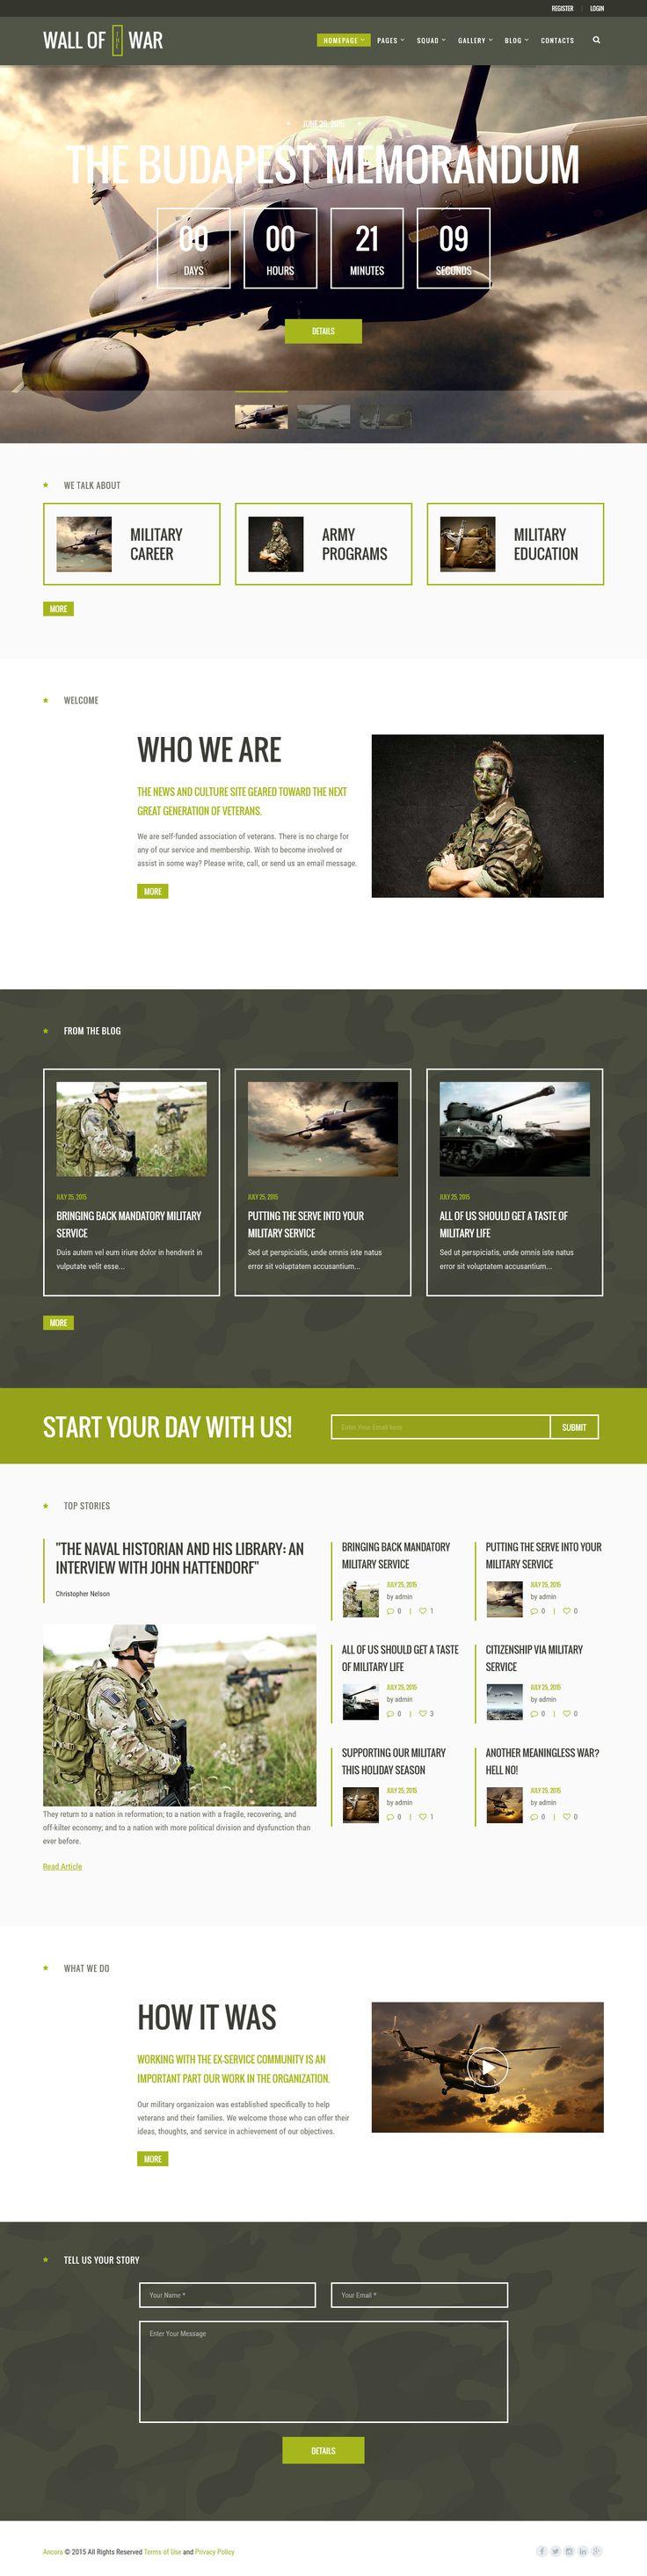 Military | Veterans & Military Service Theme #webdesign #website Download: http://themeforest.net/item/military-veterans-military-service-theme/12370769?ref=ksioks